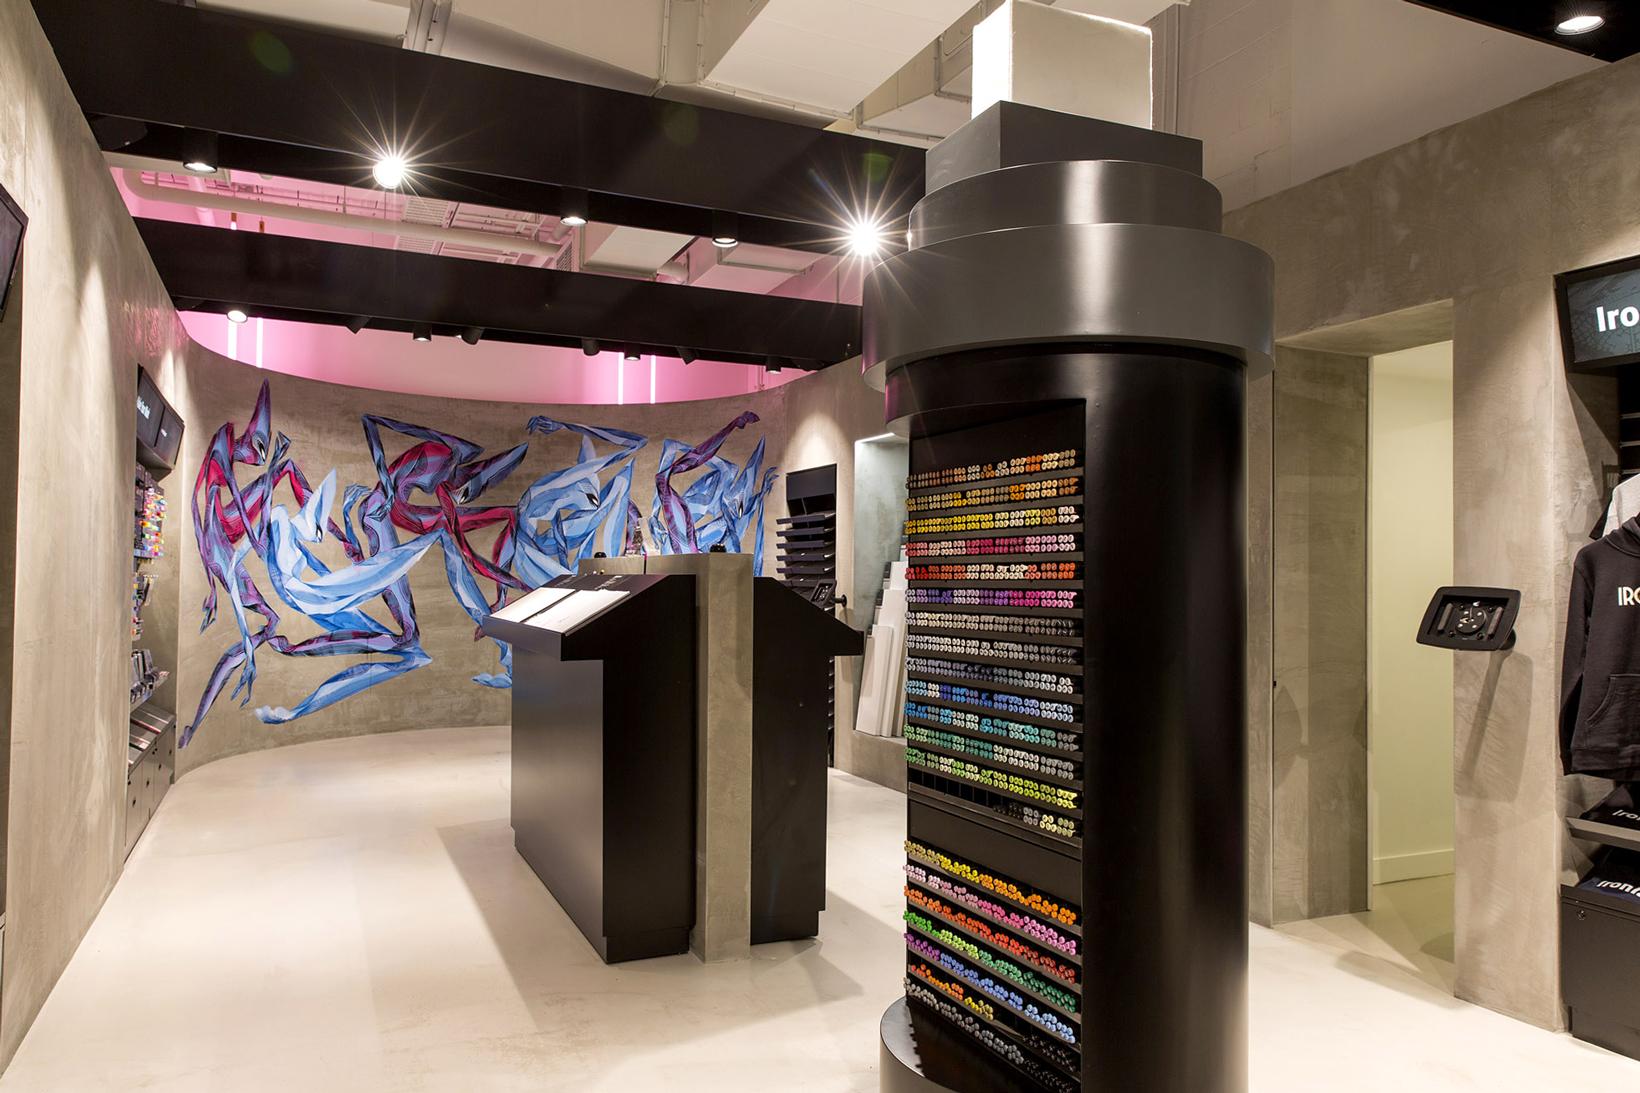 Ironlak Art & Design Sydney Flagship Store - 1765456